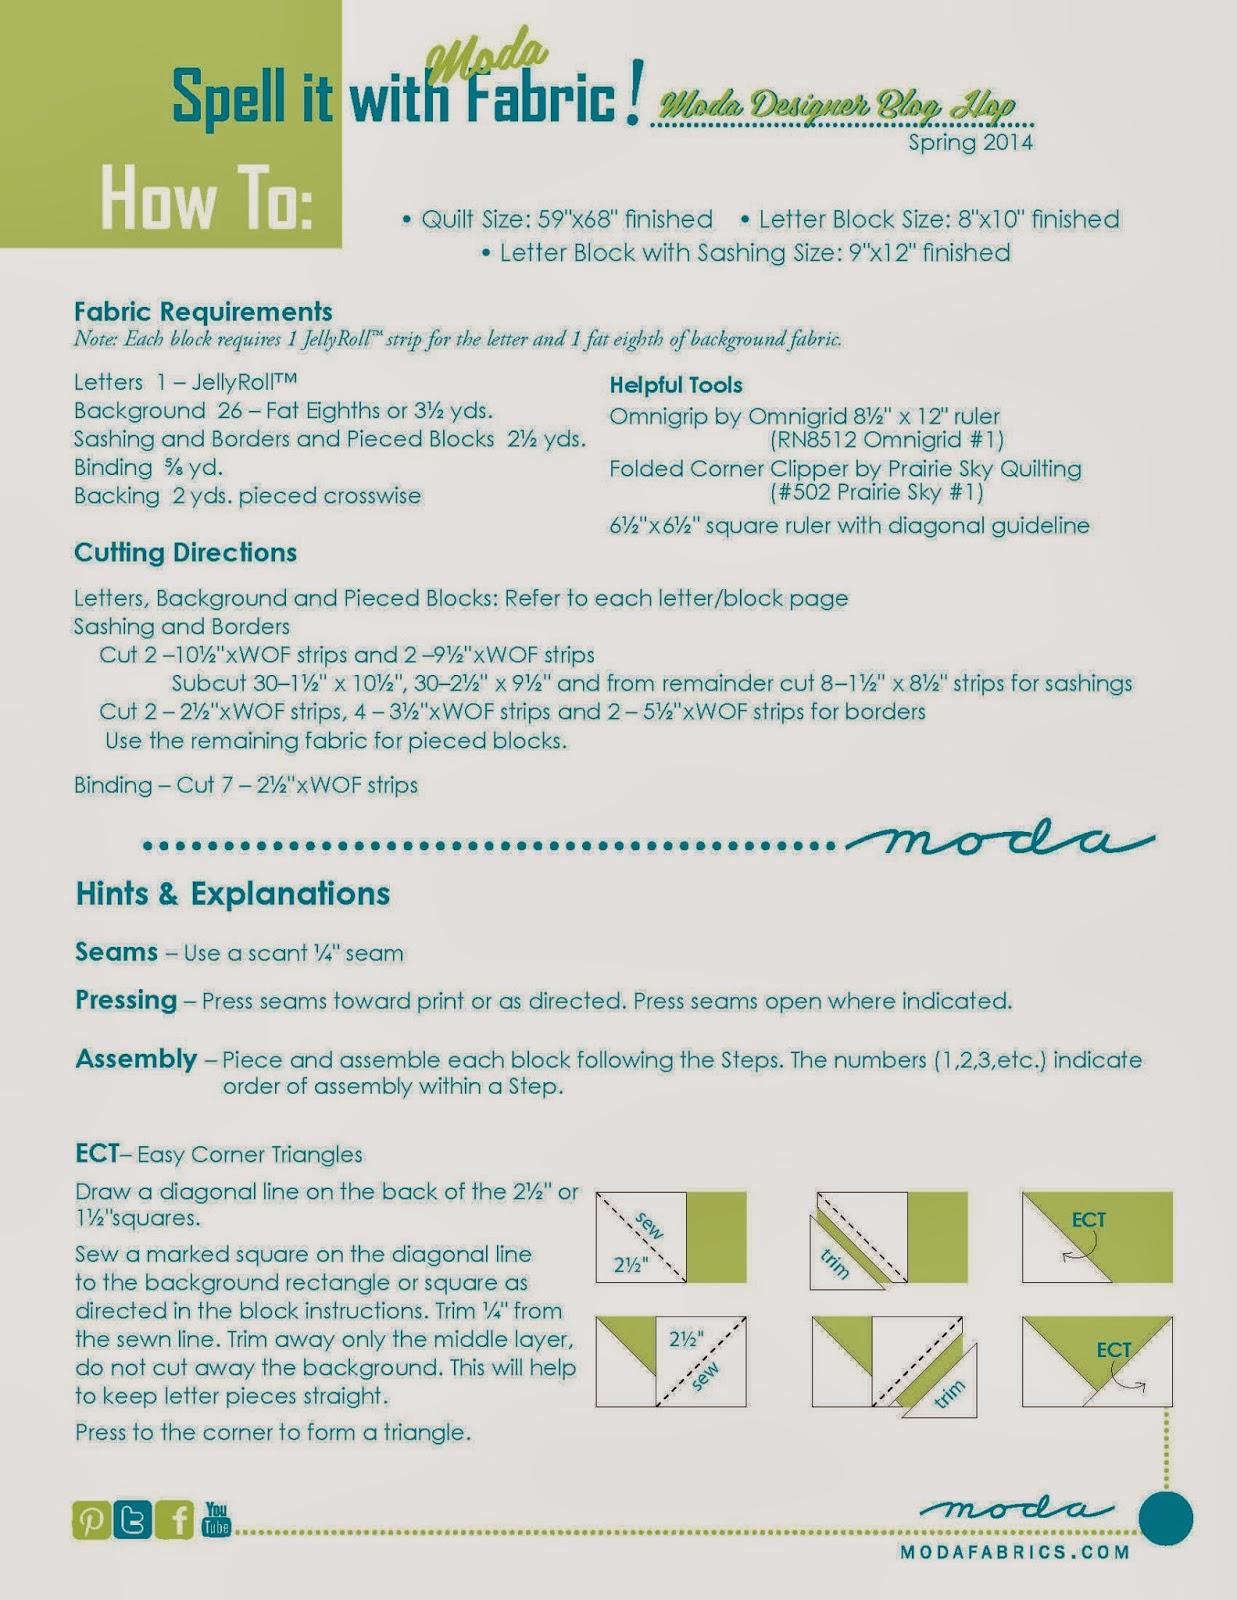 Spell it with Fabric blog hop – modafabrics